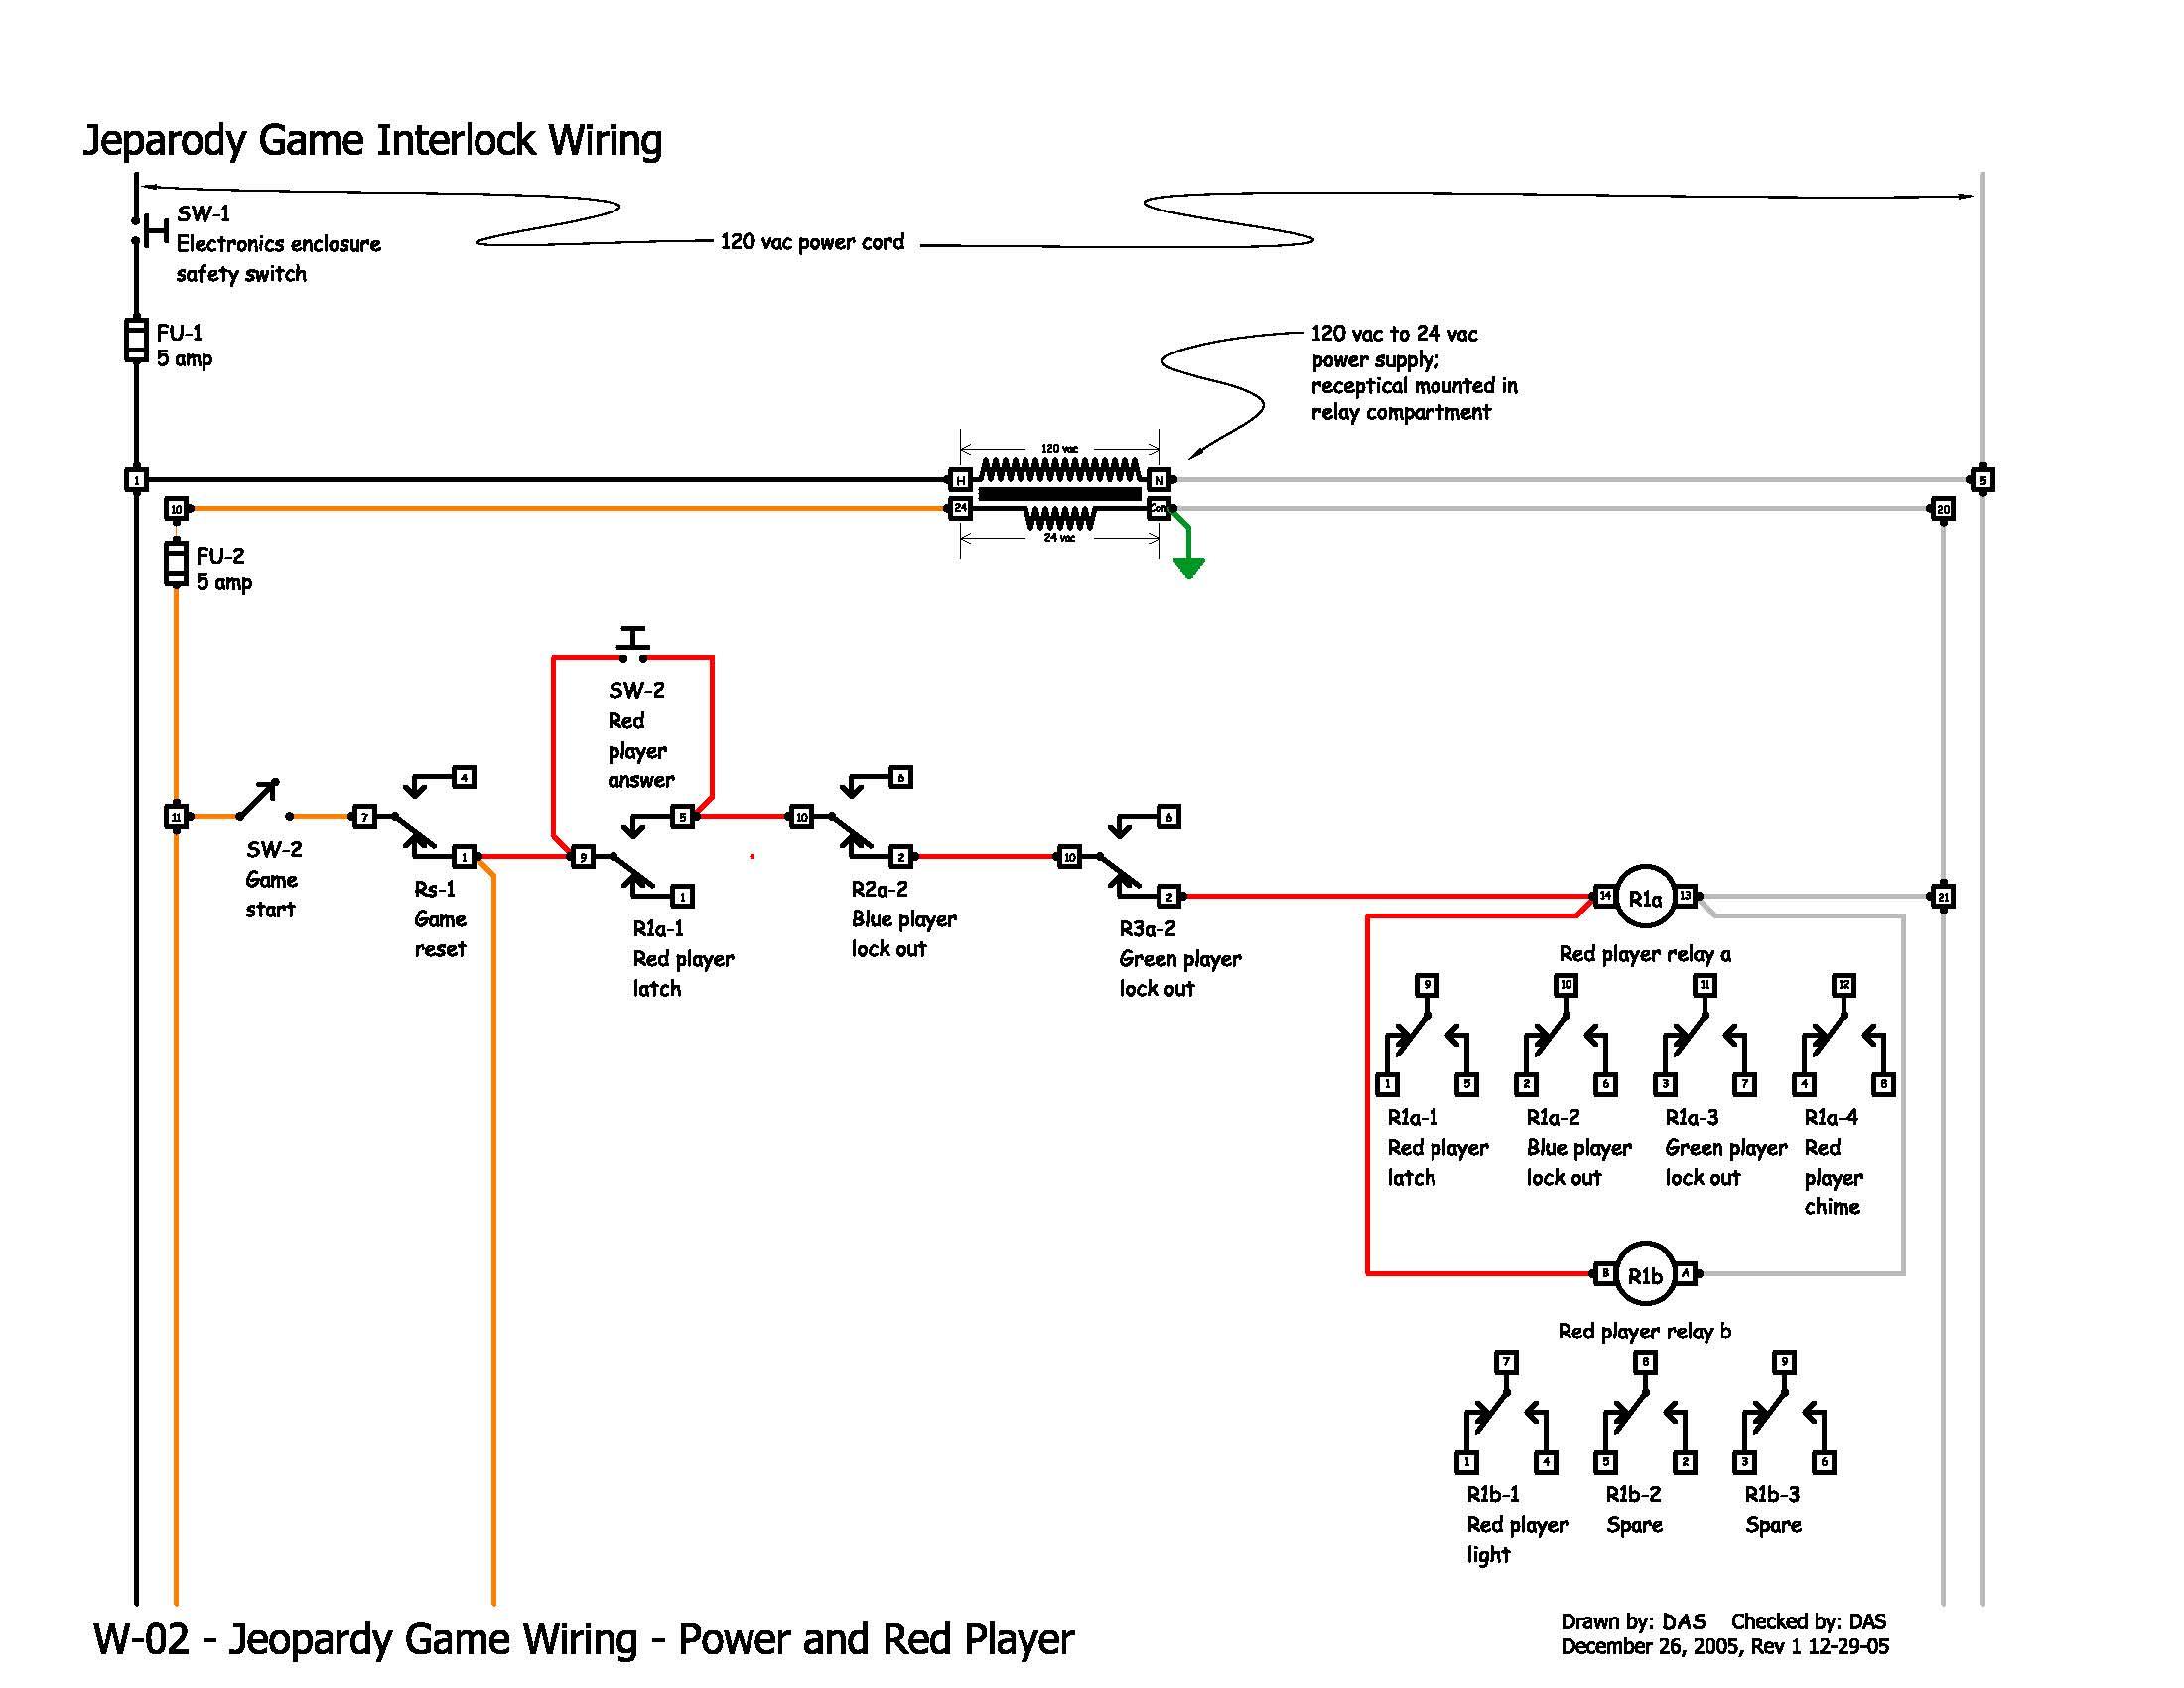 jeopardy wiring diagram wiring diagrams schematics rh woodmart co Wiring- Diagram Wiring Schematics